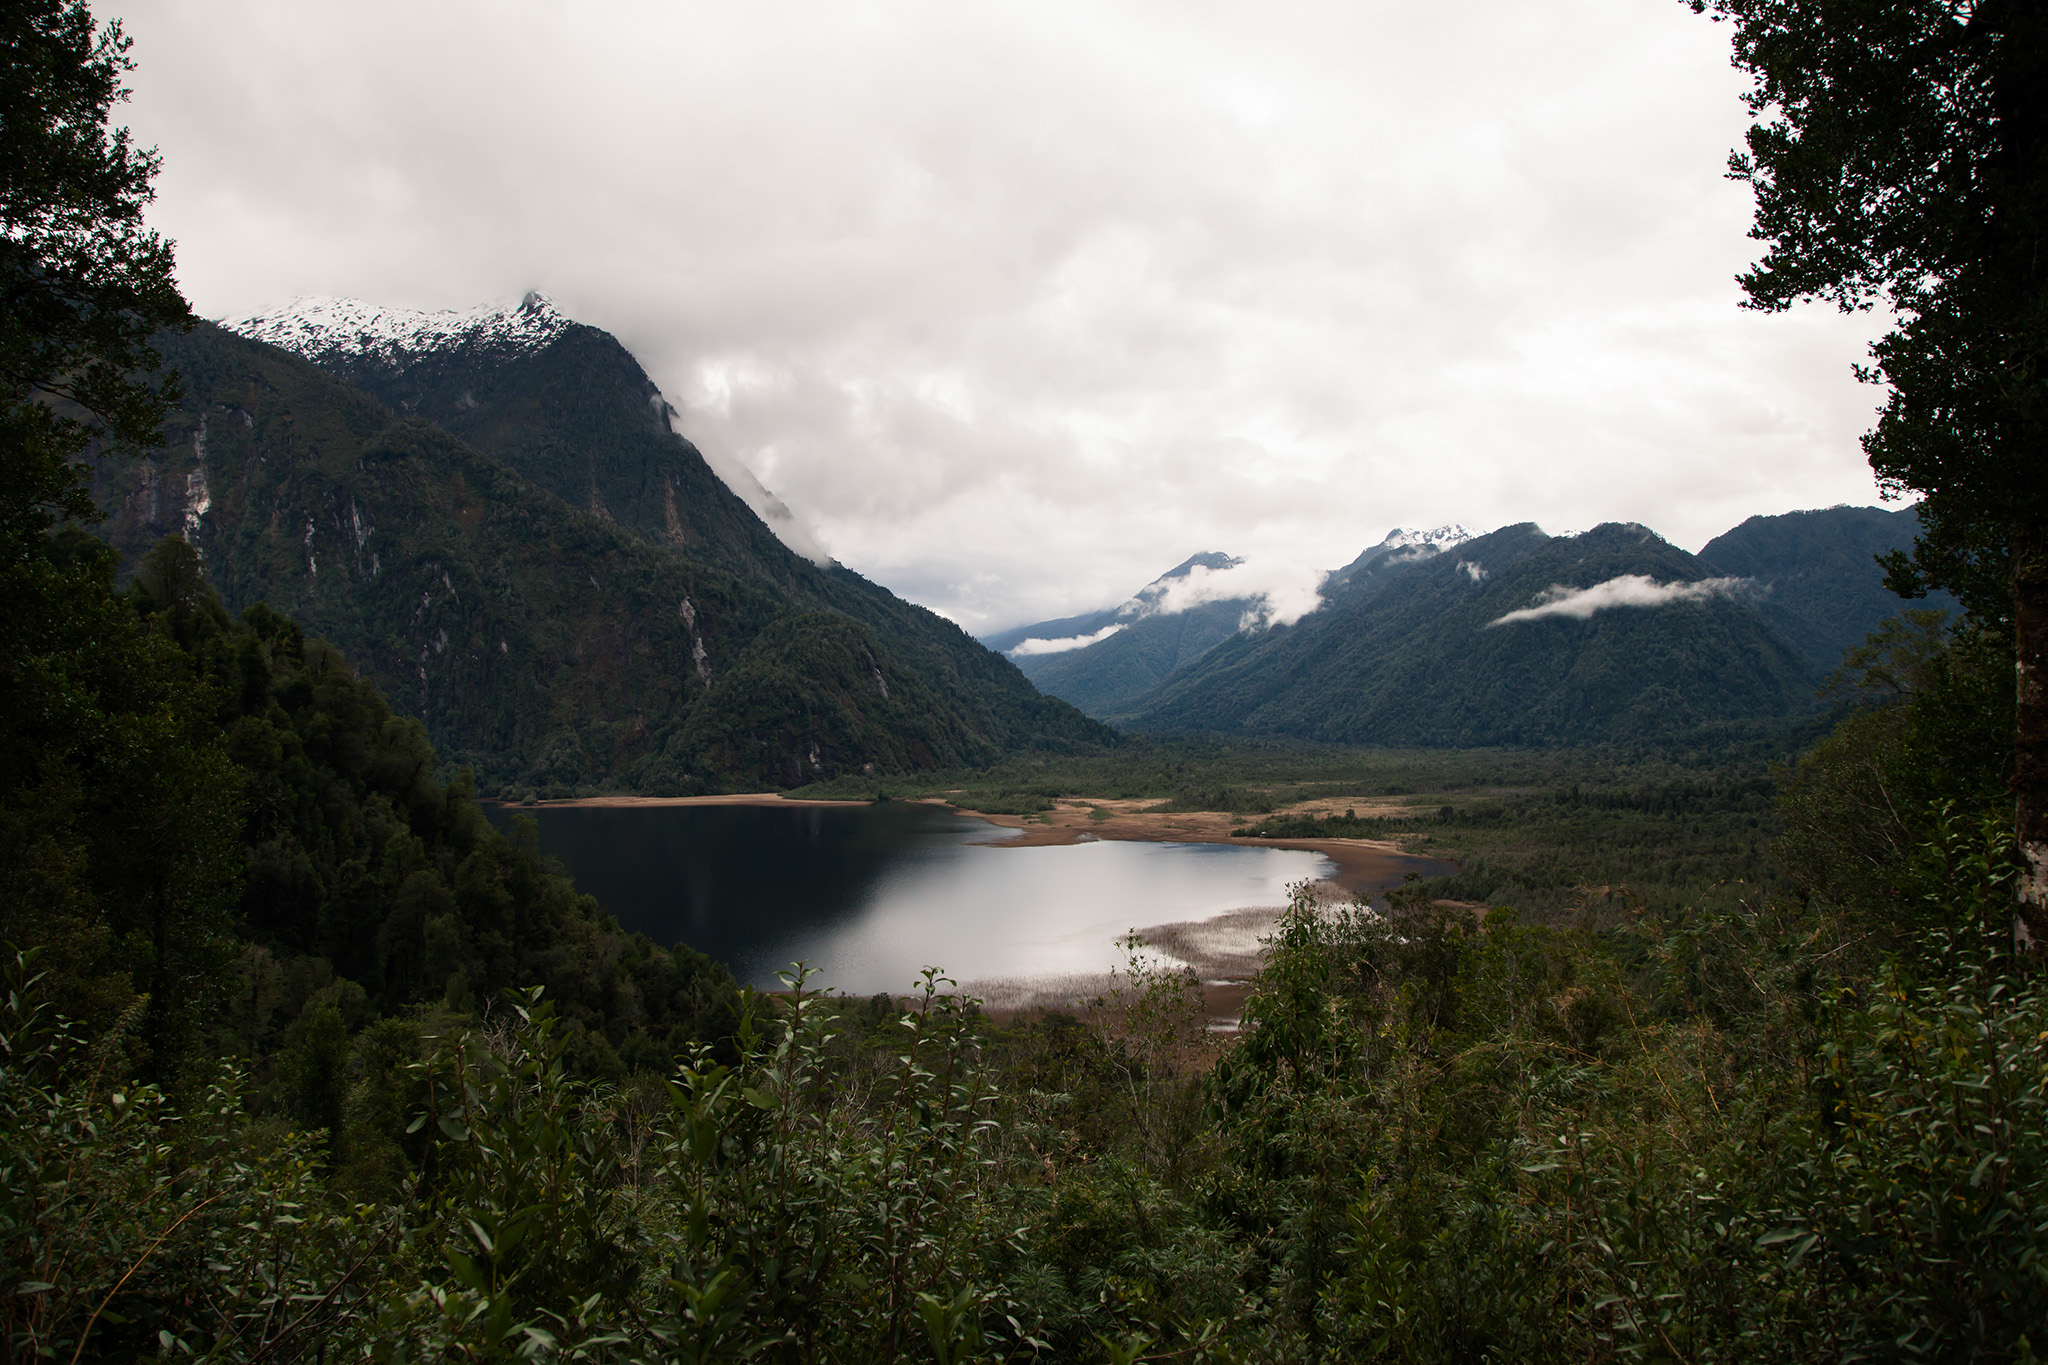 011-TW-Patagonia-140823.jpg